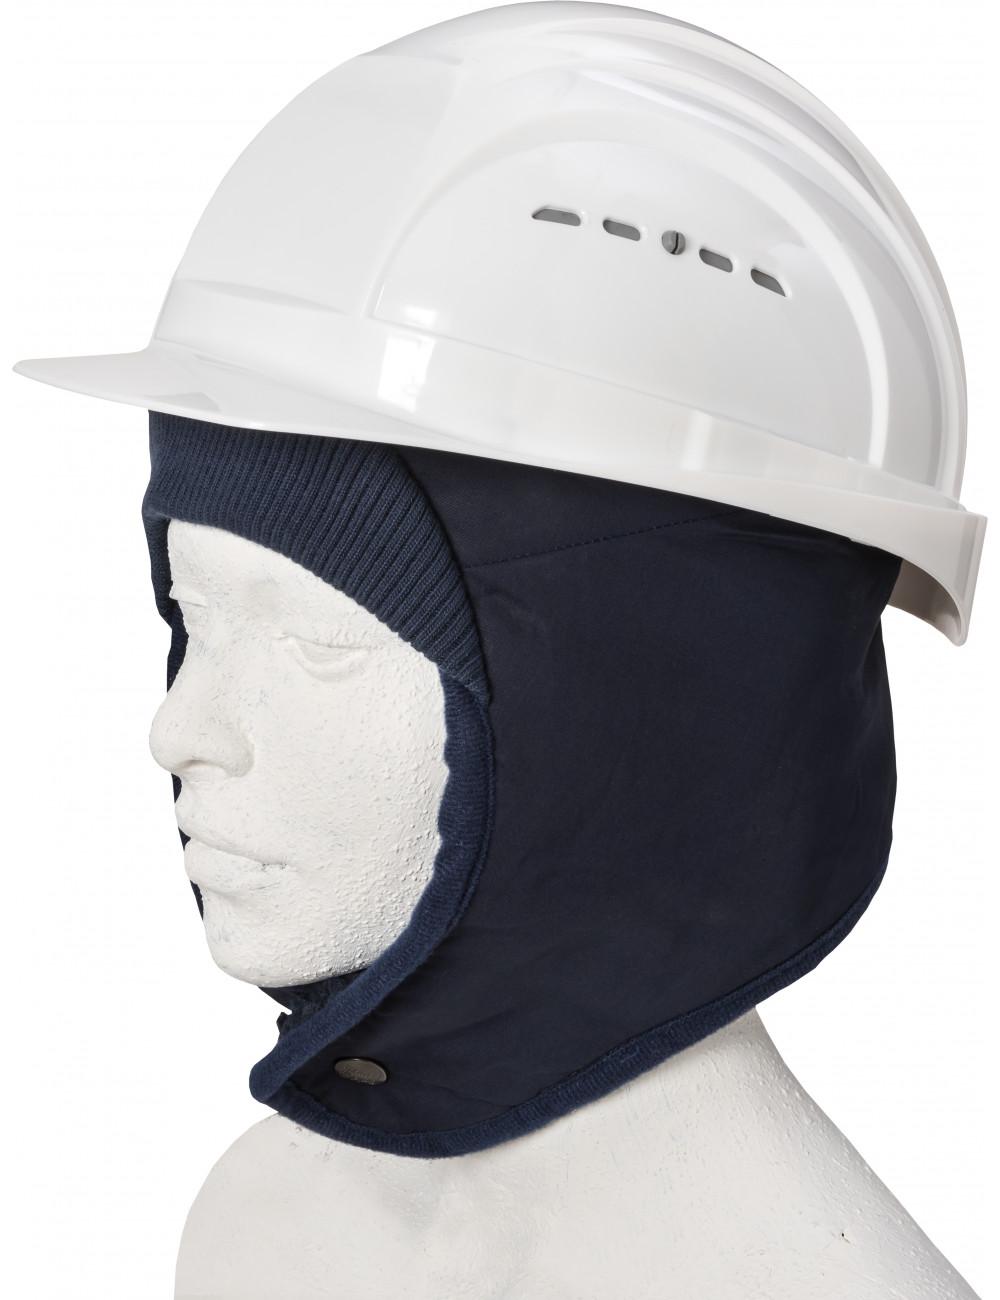 Peltor 3000 Safety Helmet with thermal liner